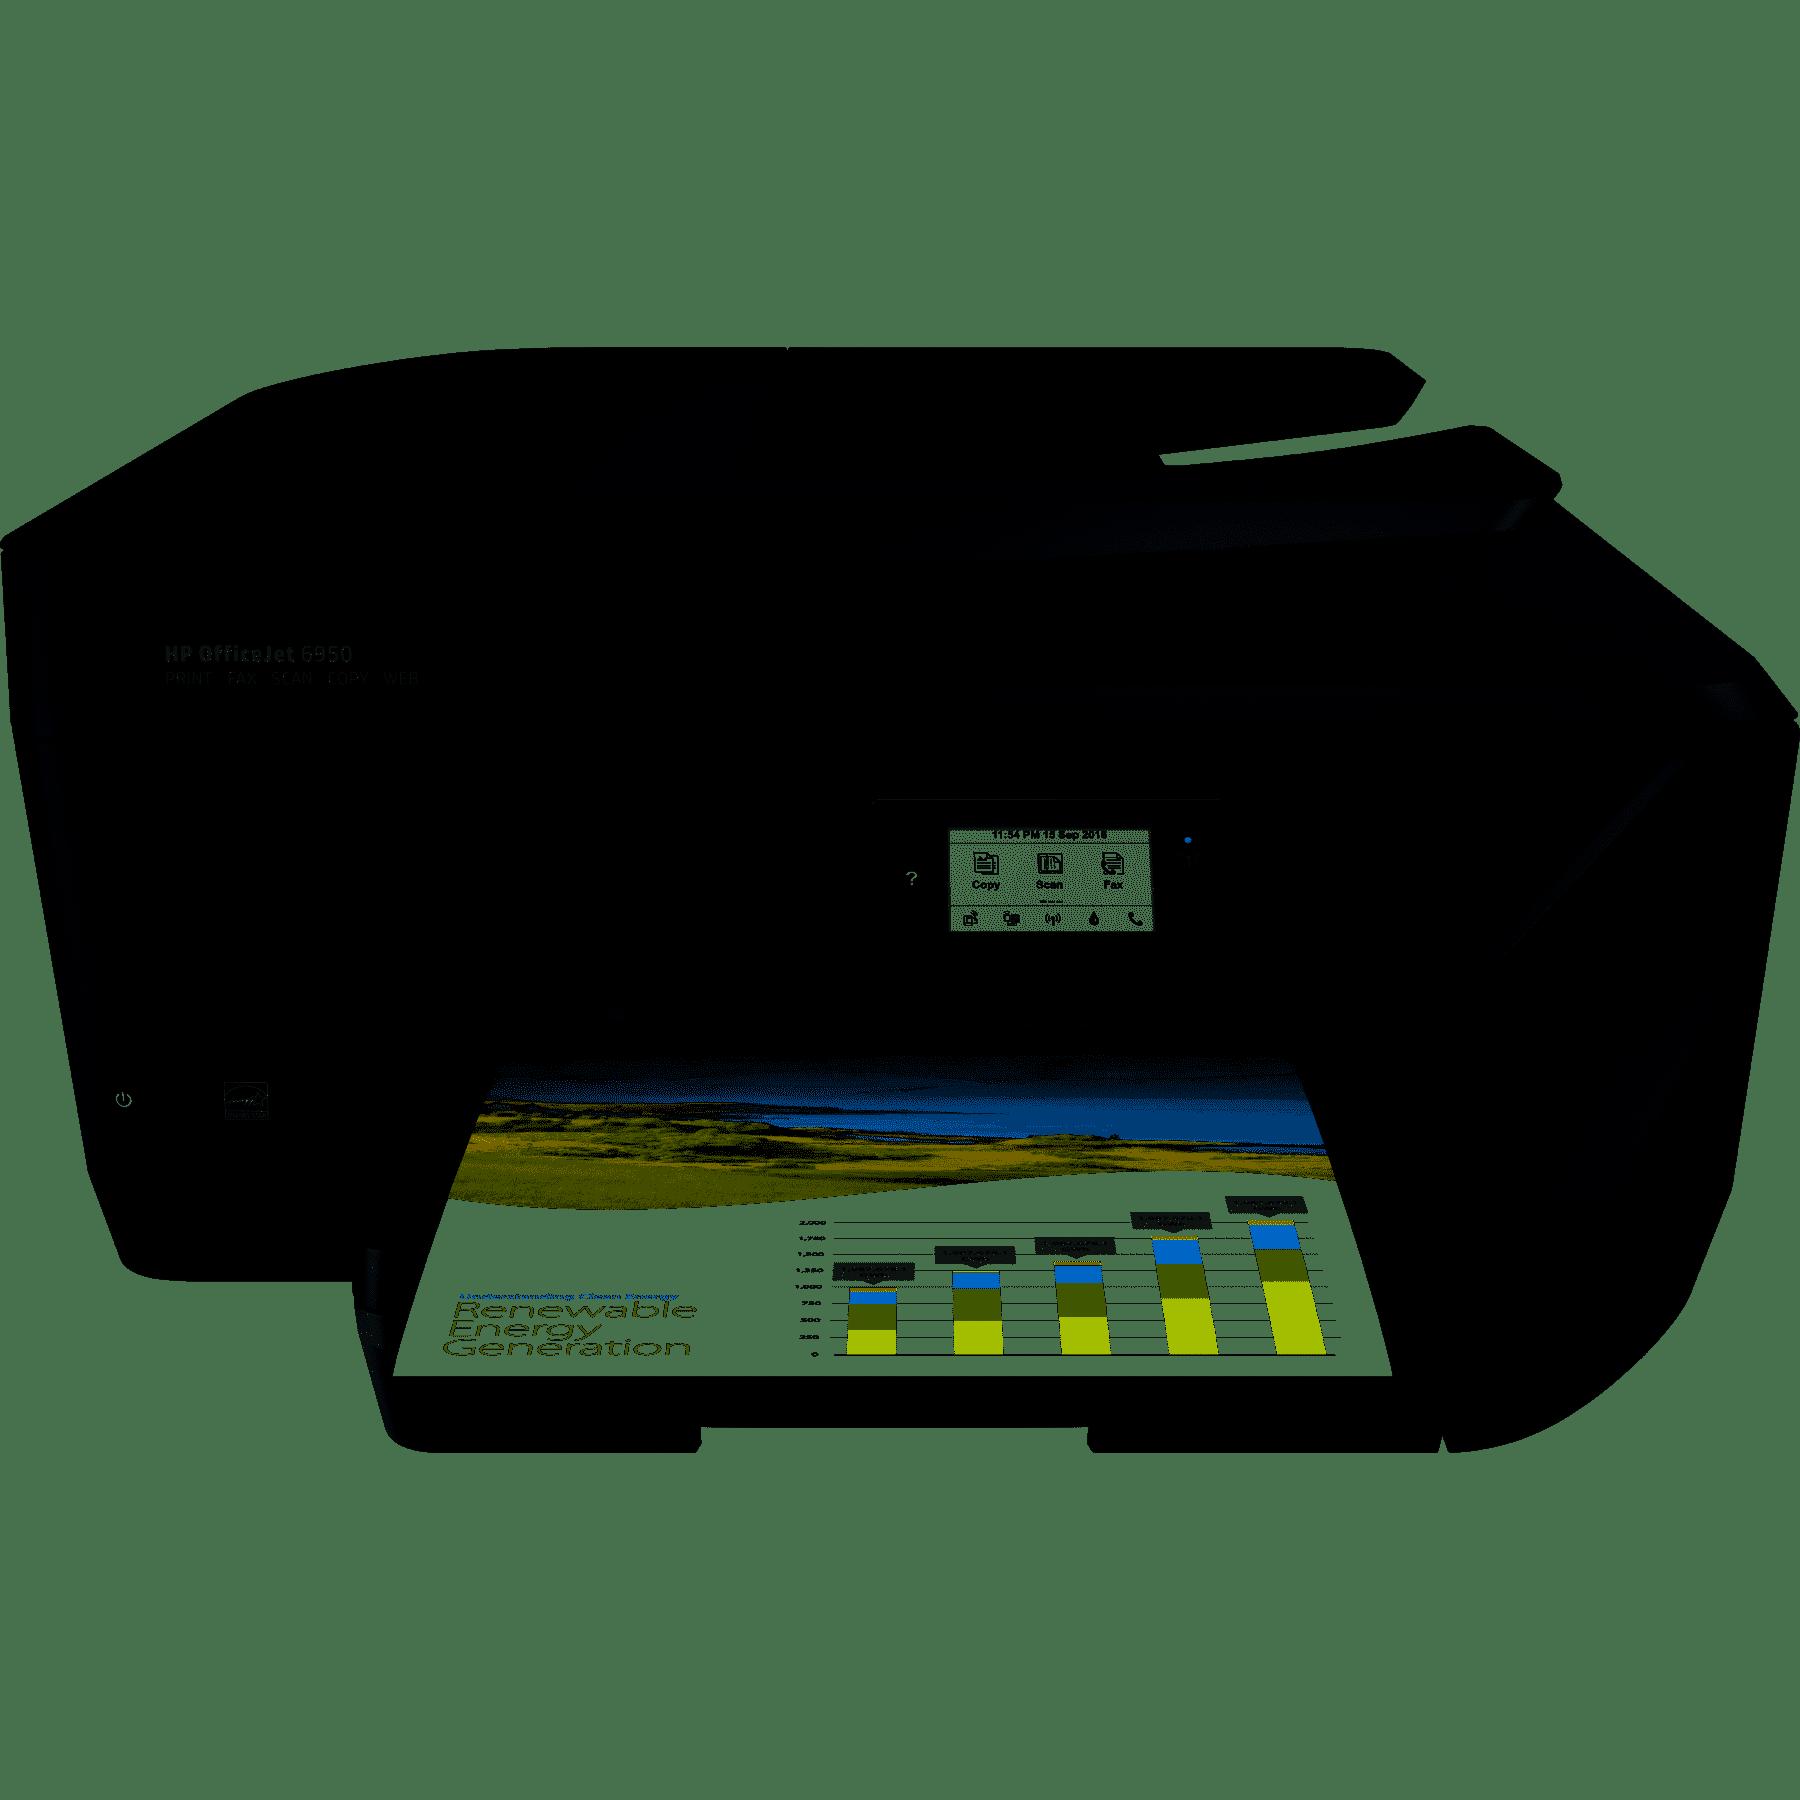 hp-officejet-6950-e-all-in-one